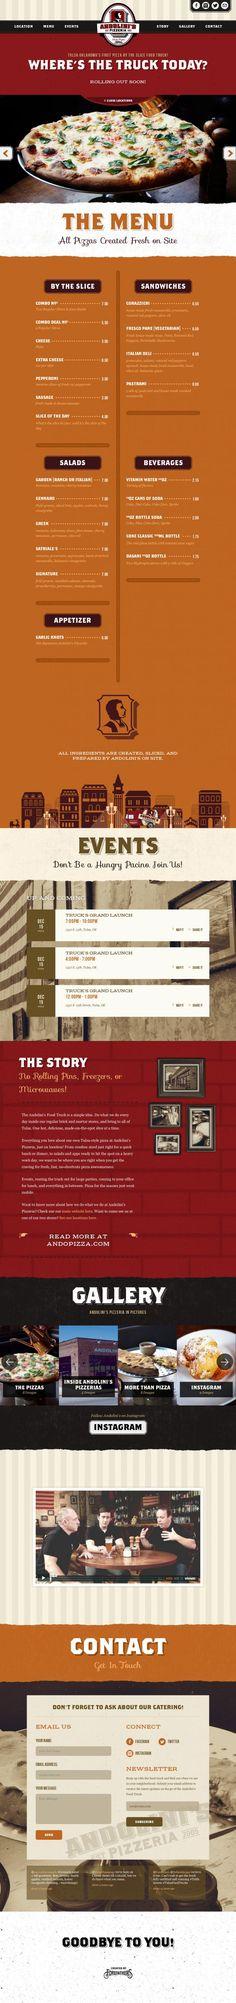 Andolinis Pizzeria Food Truck - Best website, web design inspiration showcase